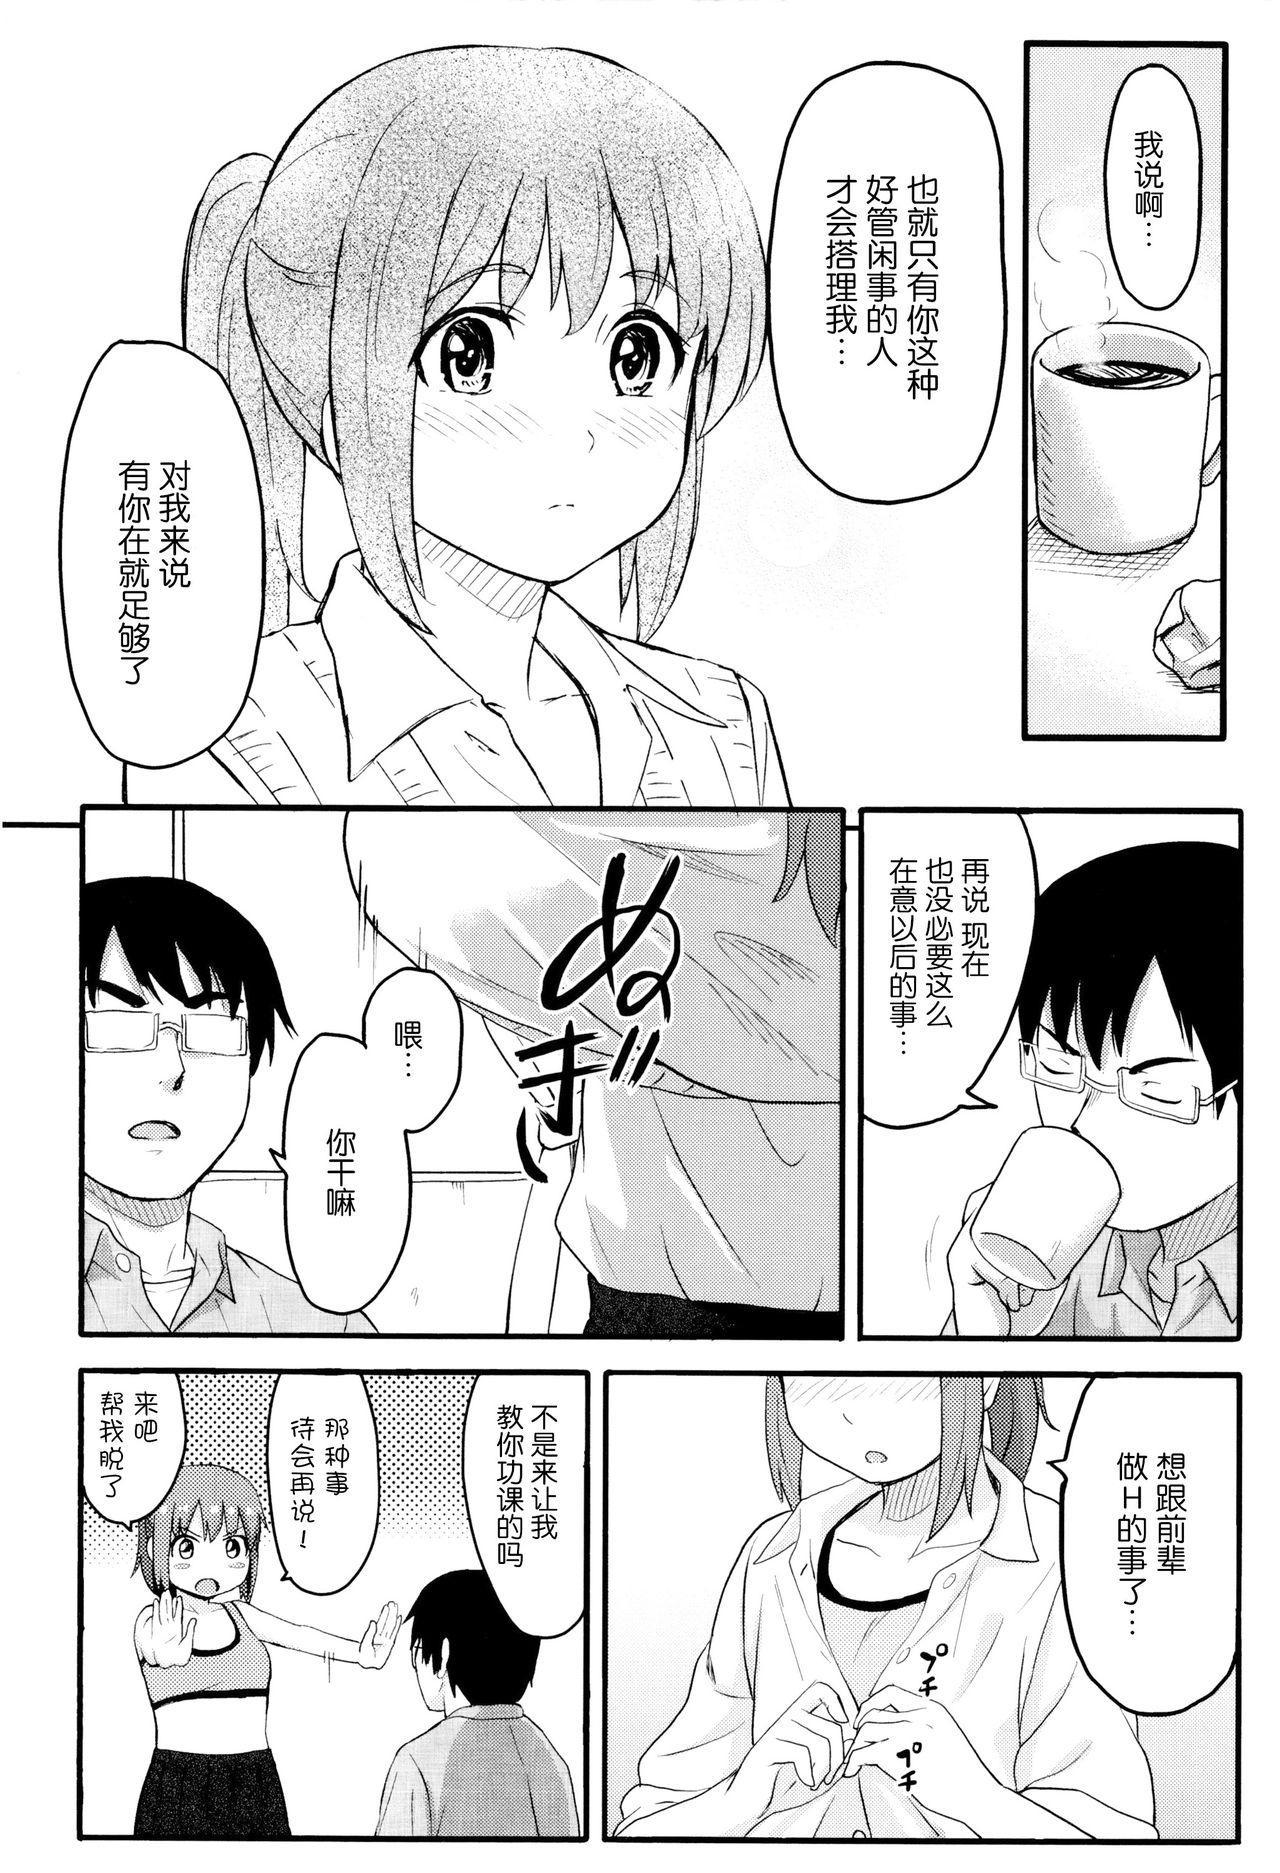 Tokubetsu na Mainichi - Special daily 146